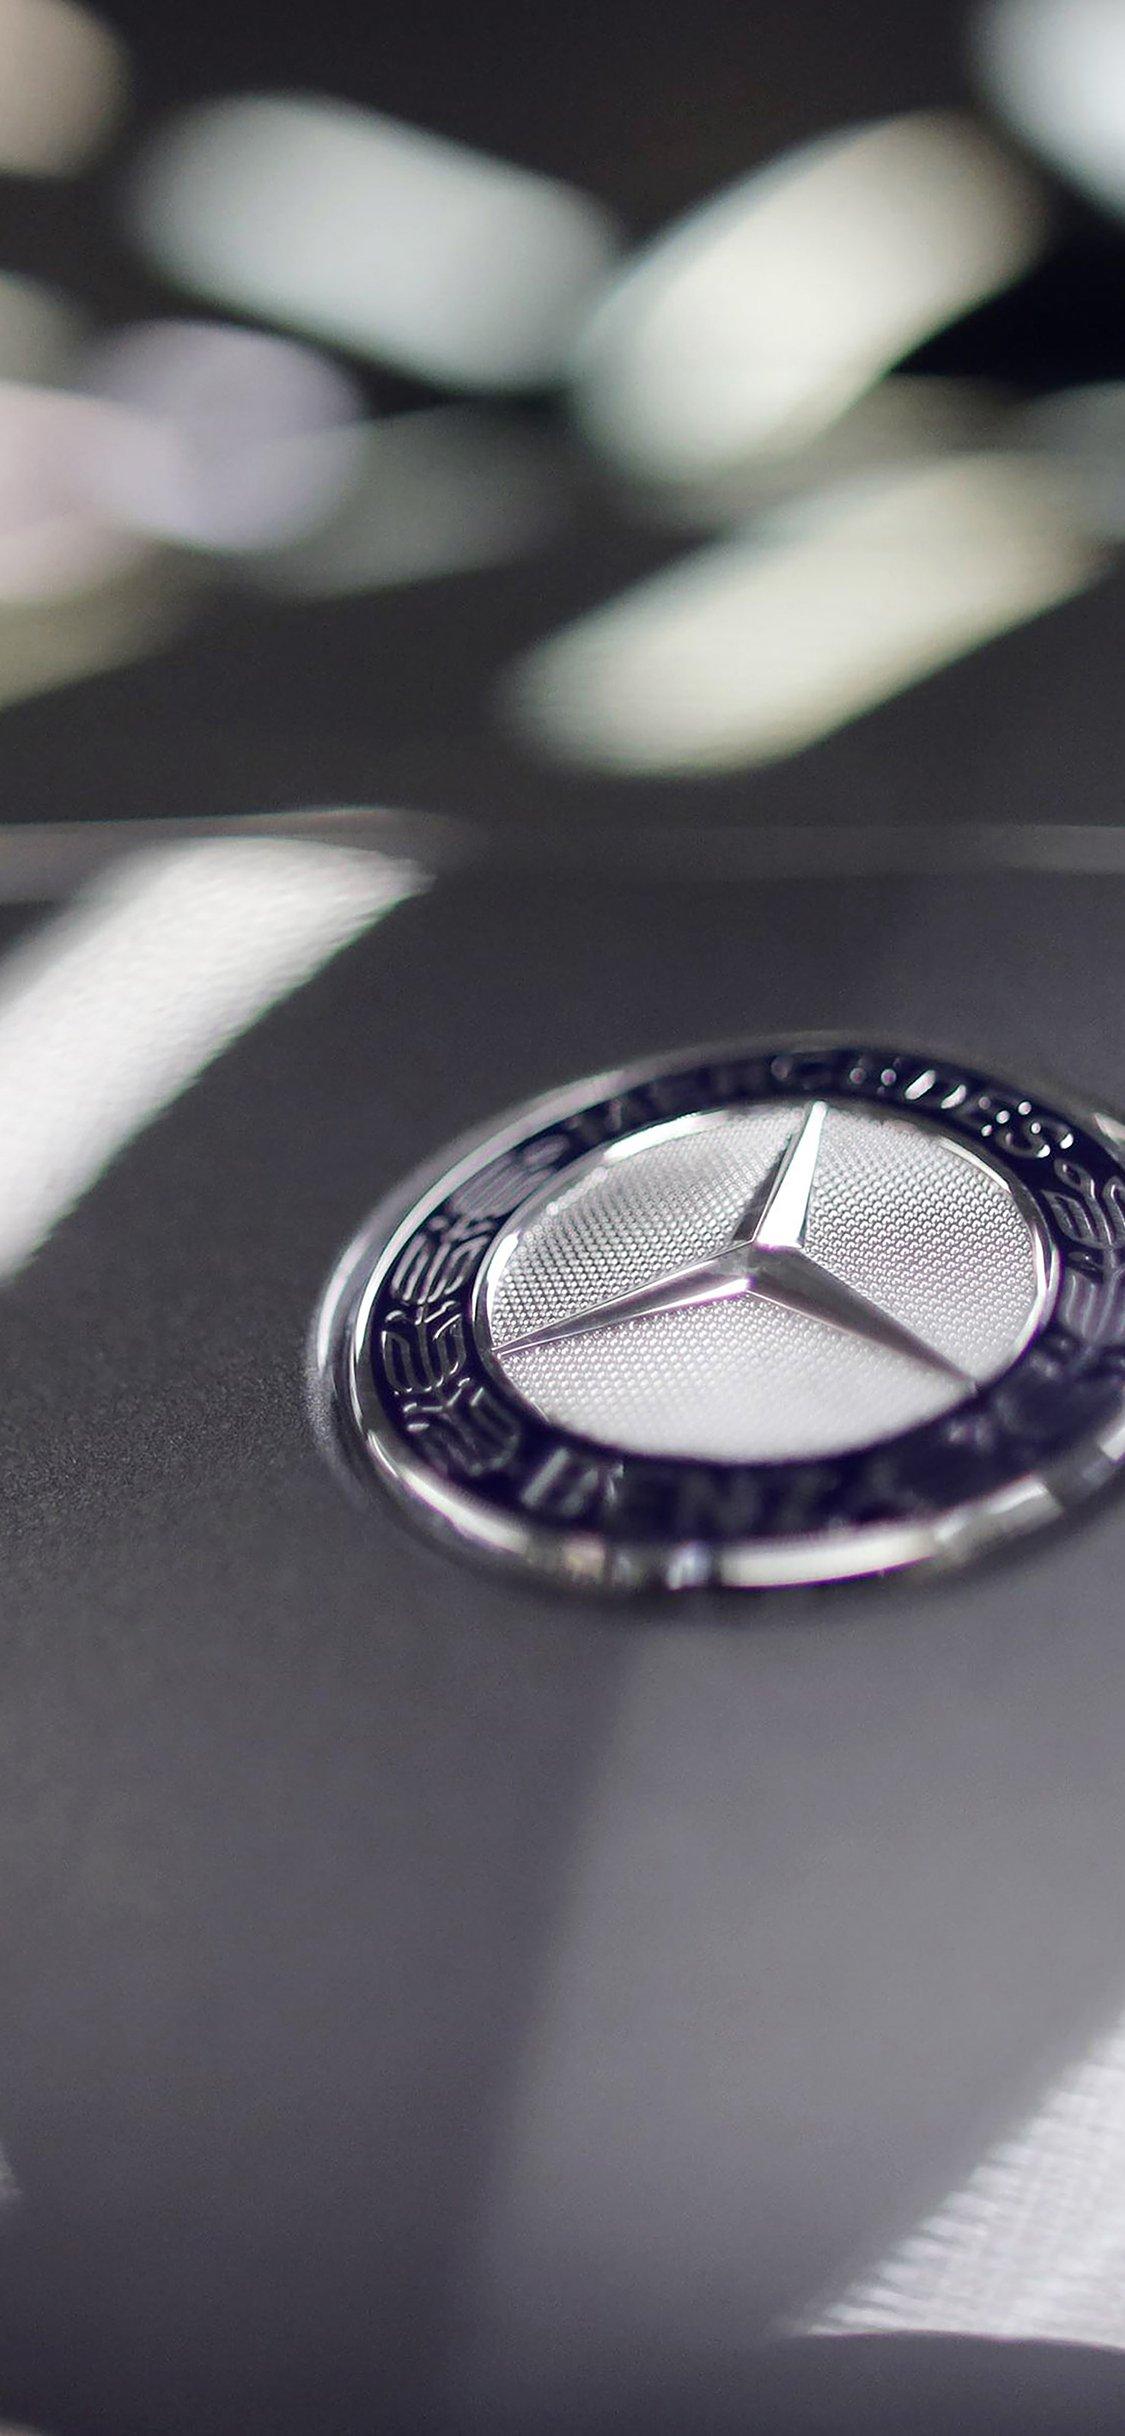 Benz Logo Car Art Iphone X Wallpapers Free Download